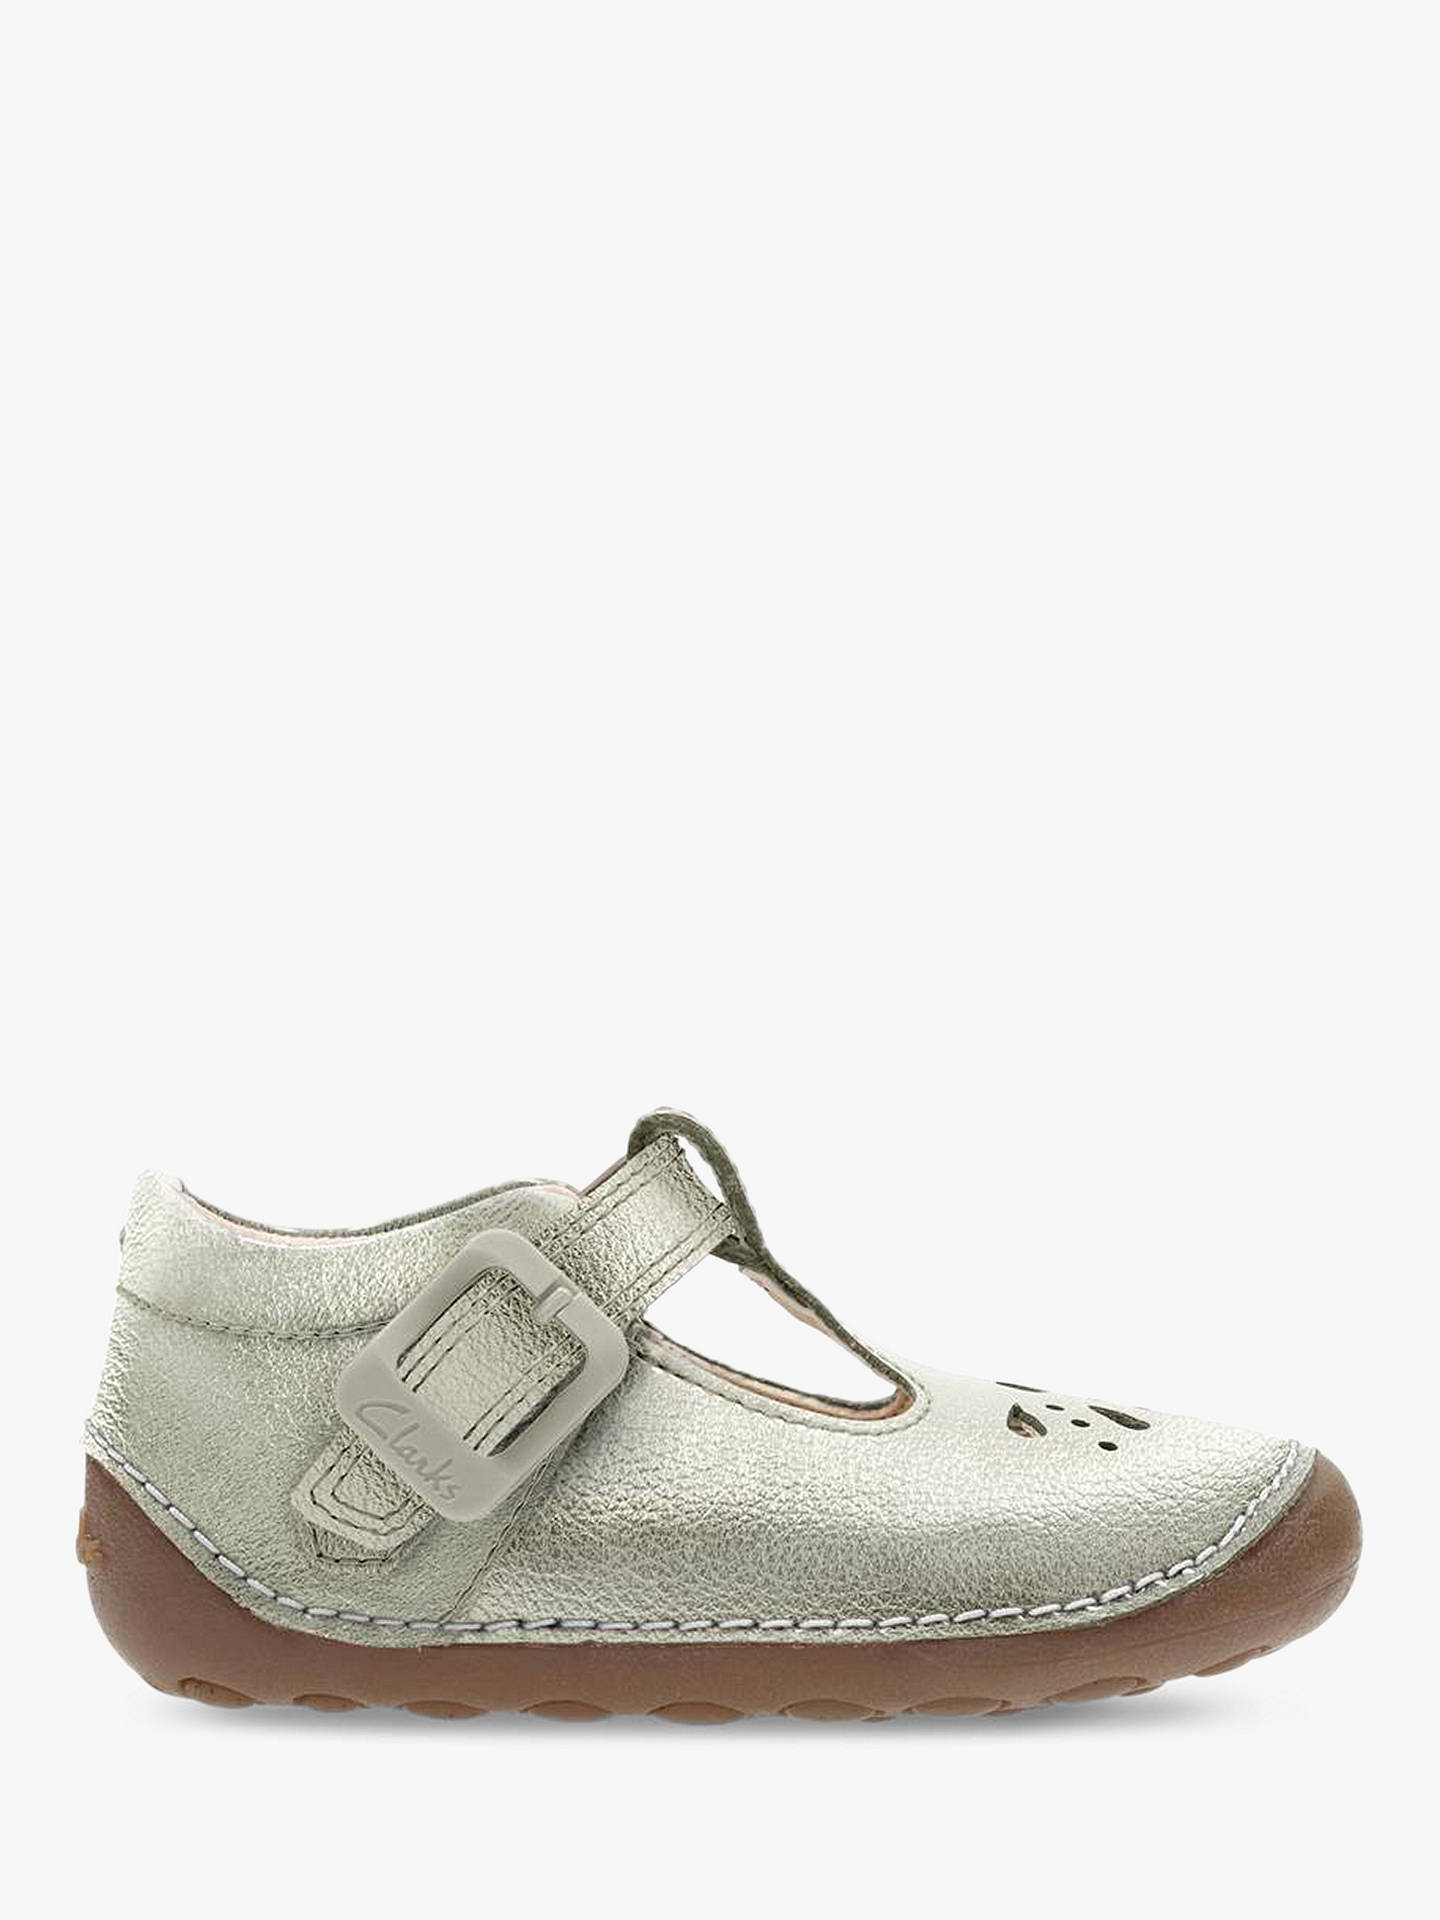 de9ef4c752fad Buy Clarks Children s Little Weave Pre-Walker Shoes